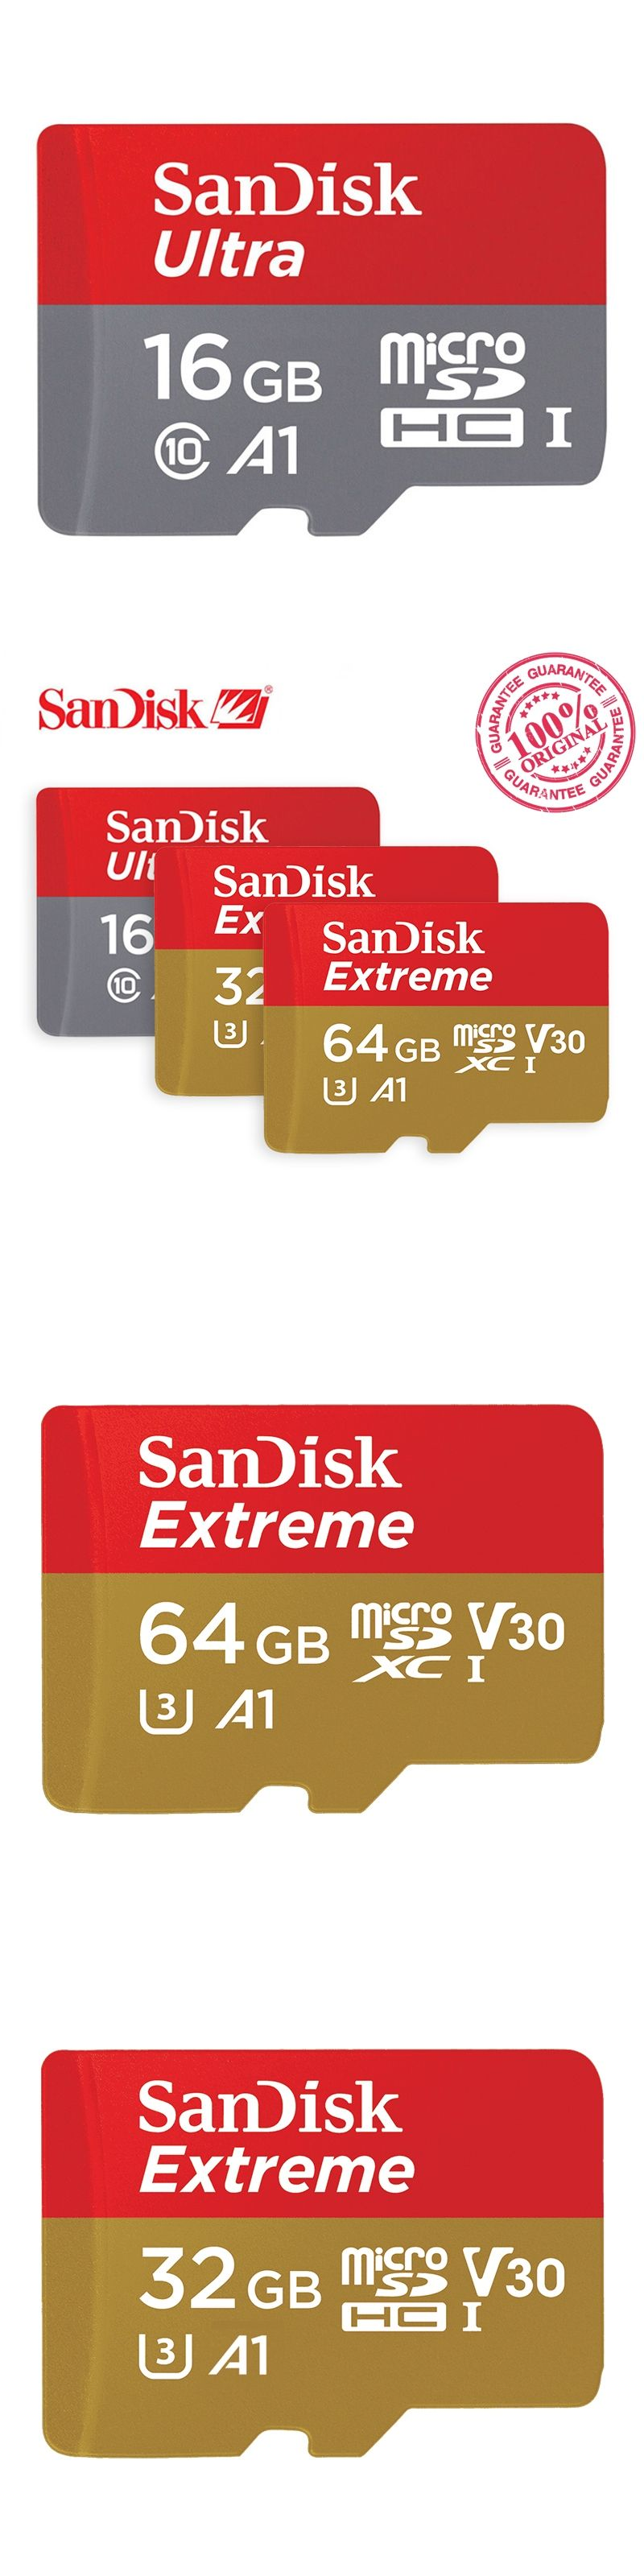 Sandisk Extremeultra Micro Sd Memory Card Uhs I Sdhc Sdxc C10 U3 New 48 Mb S 16gb Ultra 1 Class 10 Sdsqunb V30 A1